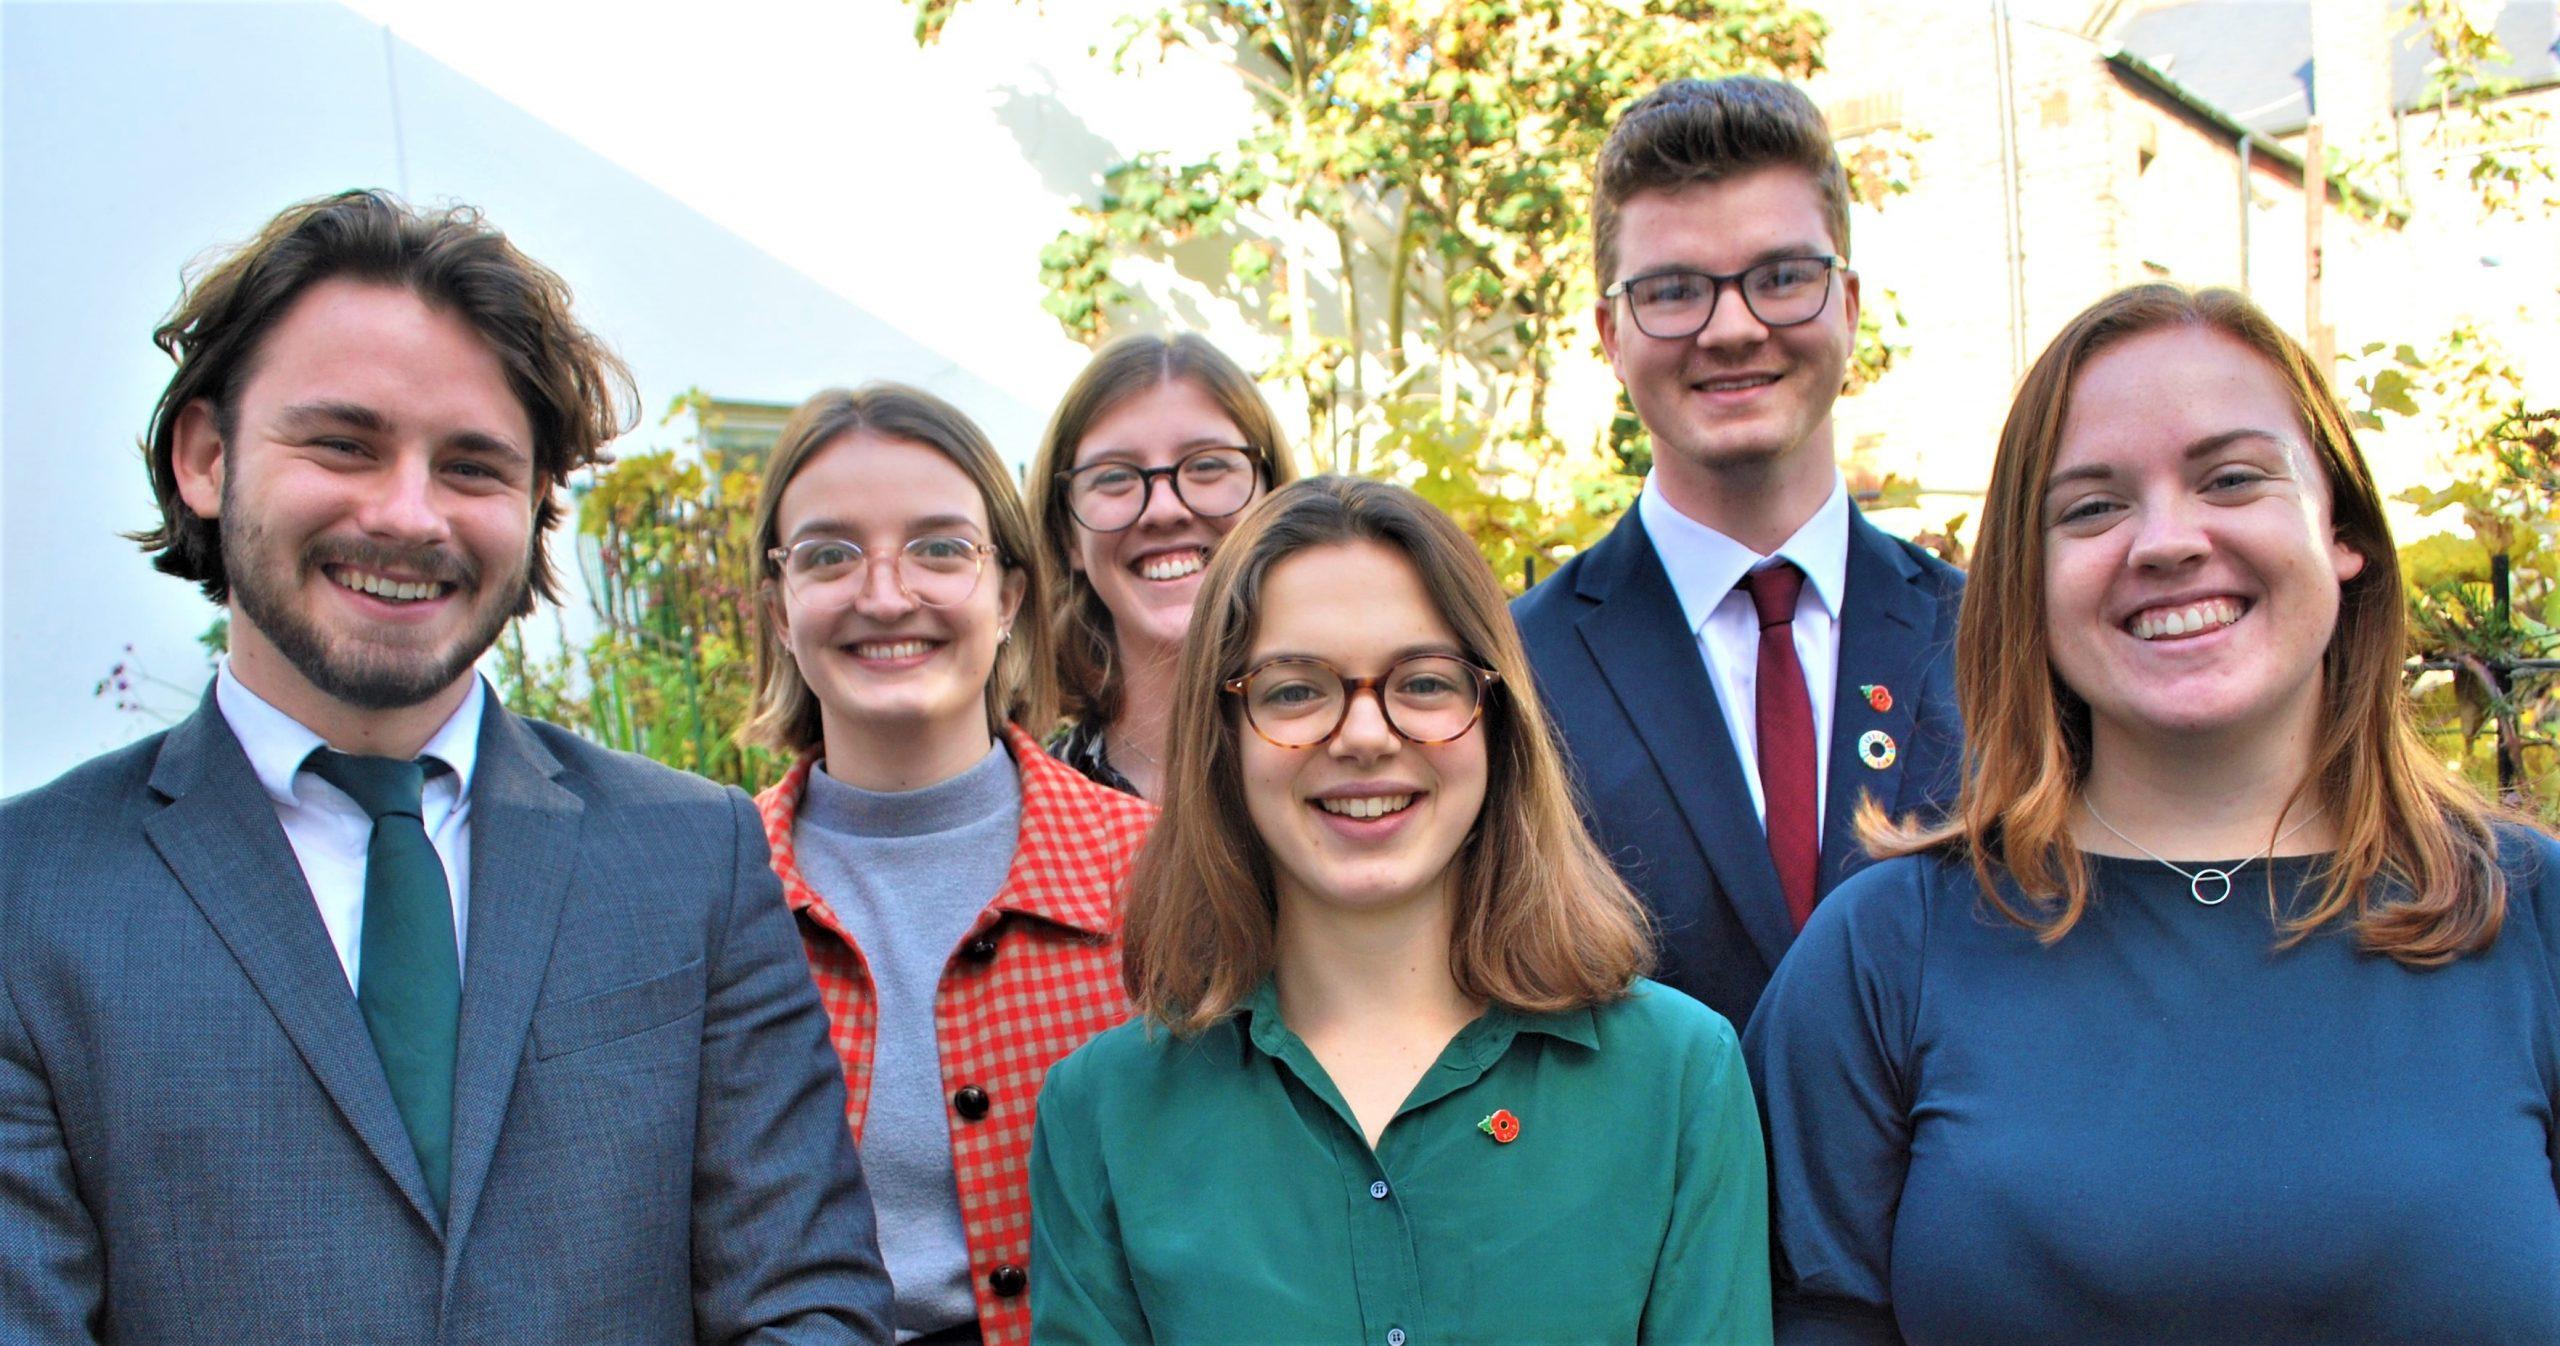 Scriptoria's internship programme cultivates the next generation of talent